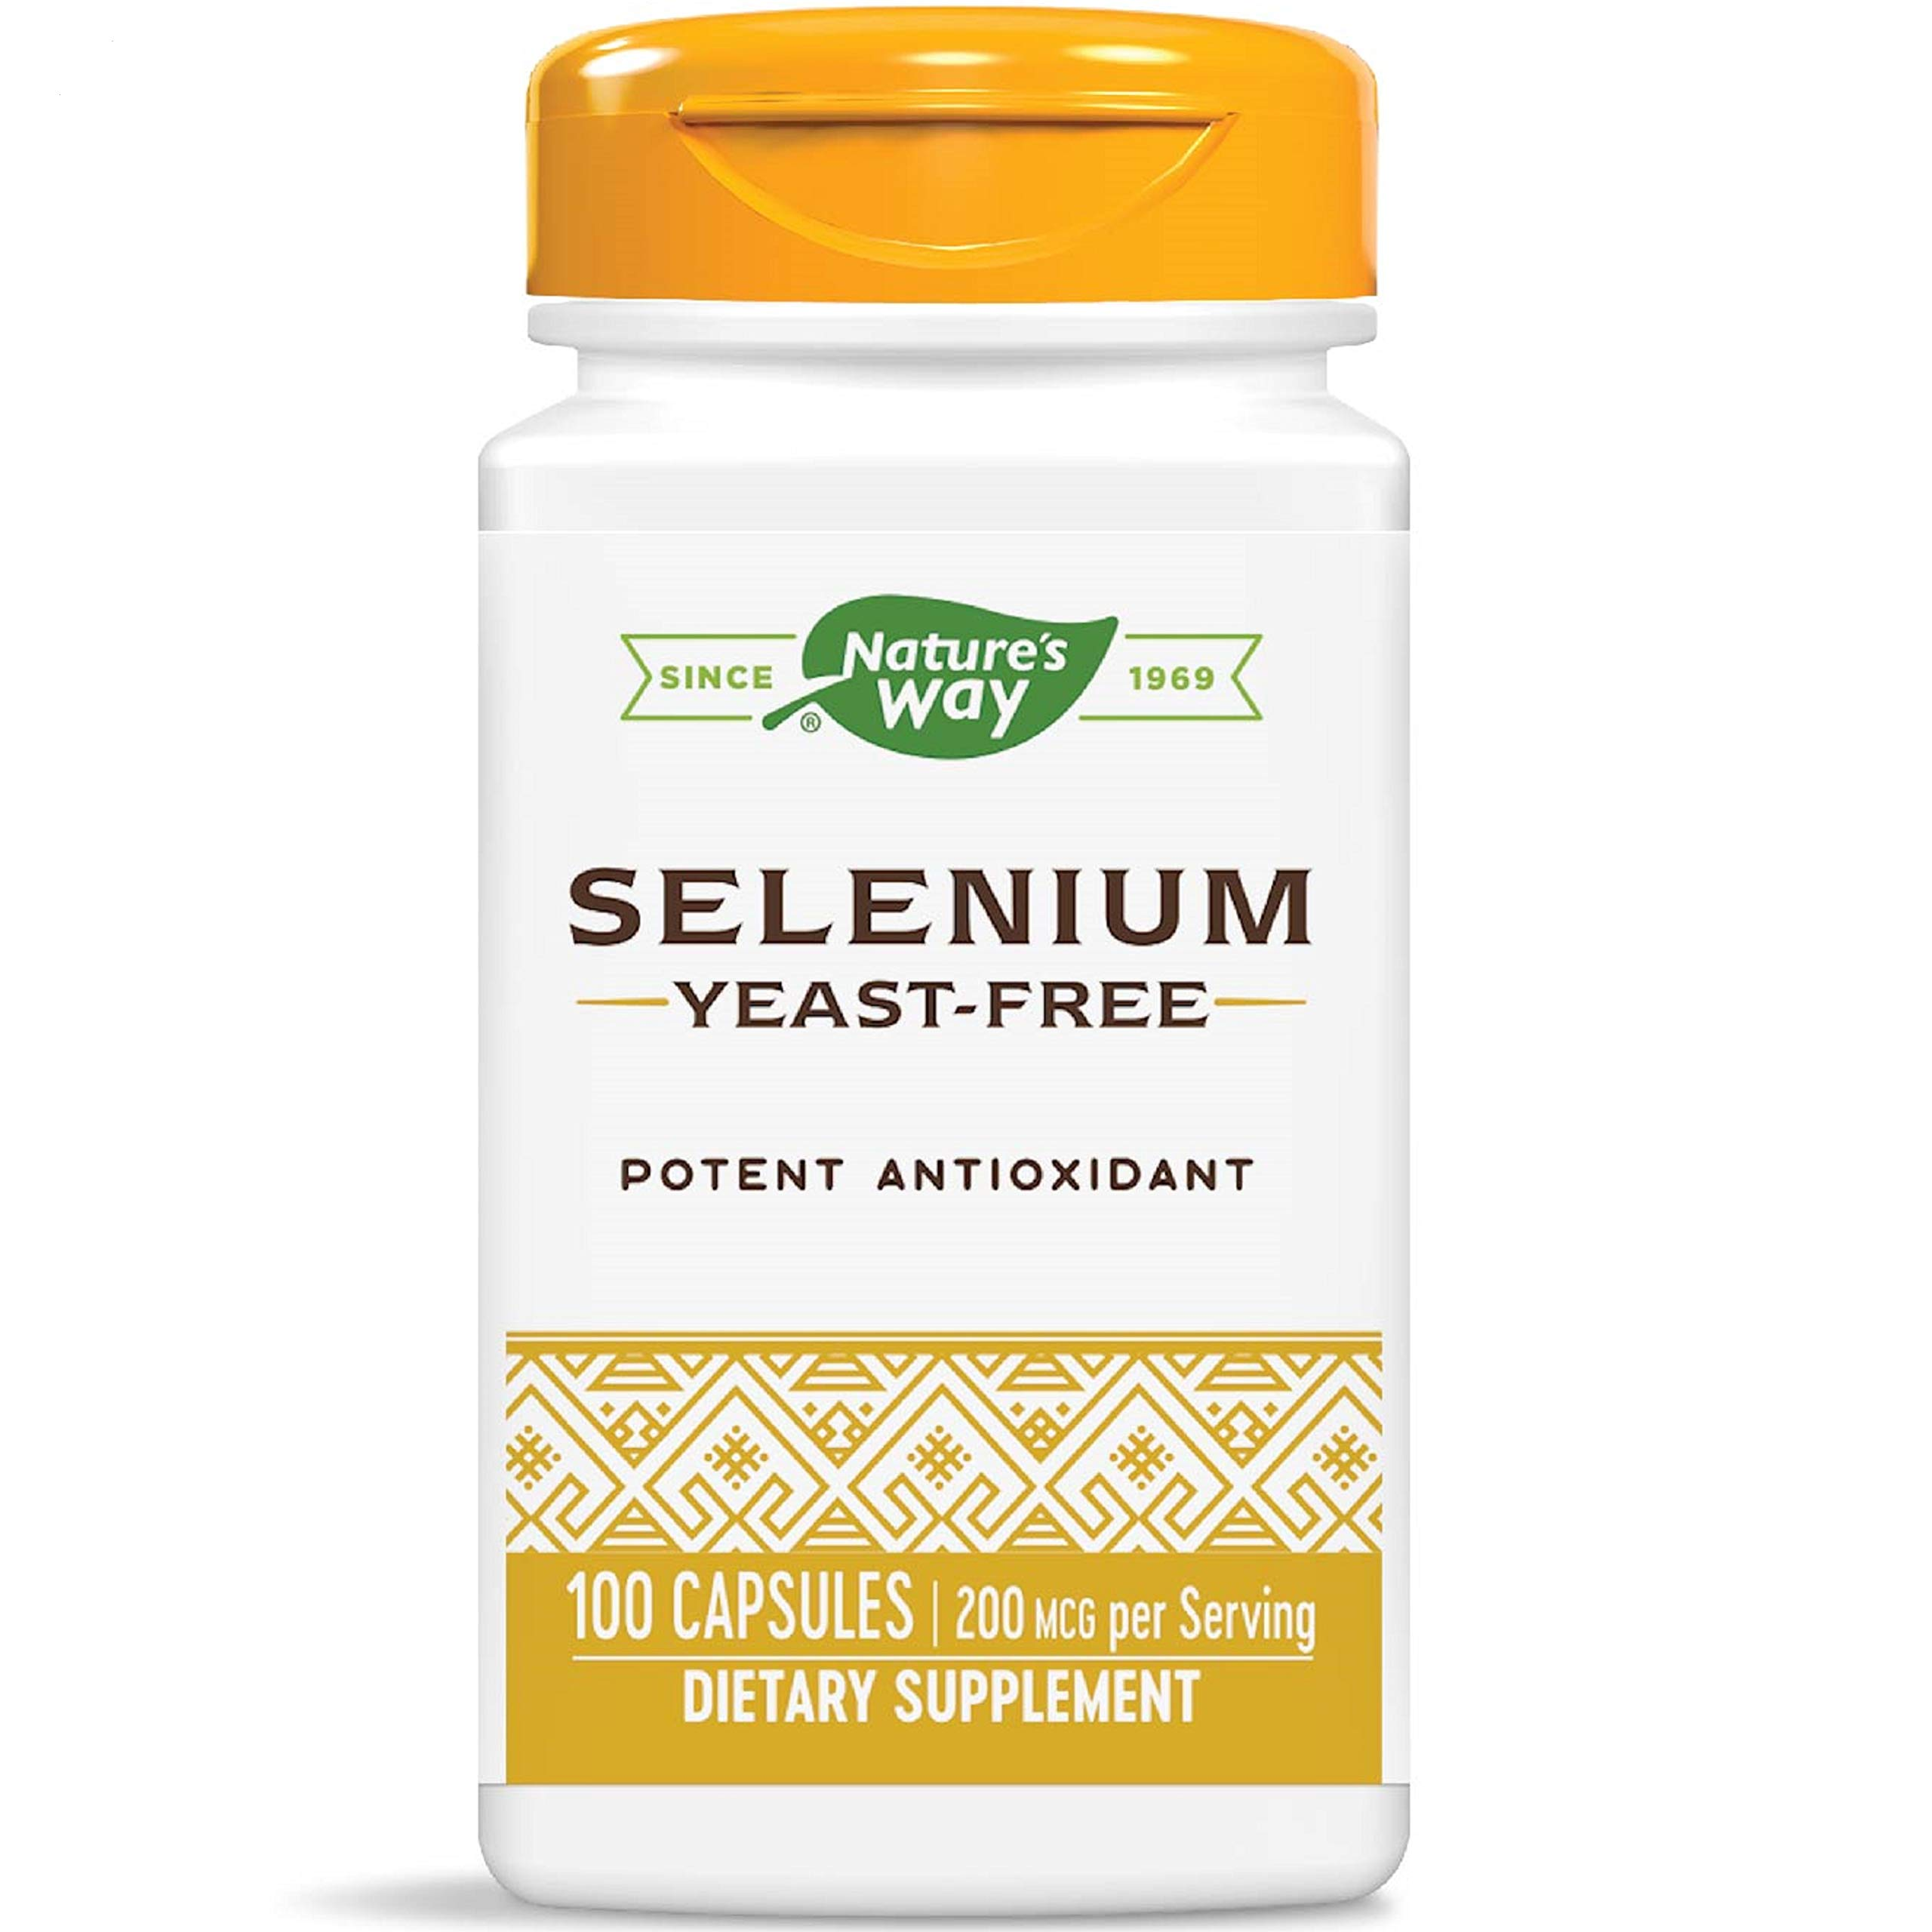 Nature's Way Selenium 200 mcg, 100 Capsules